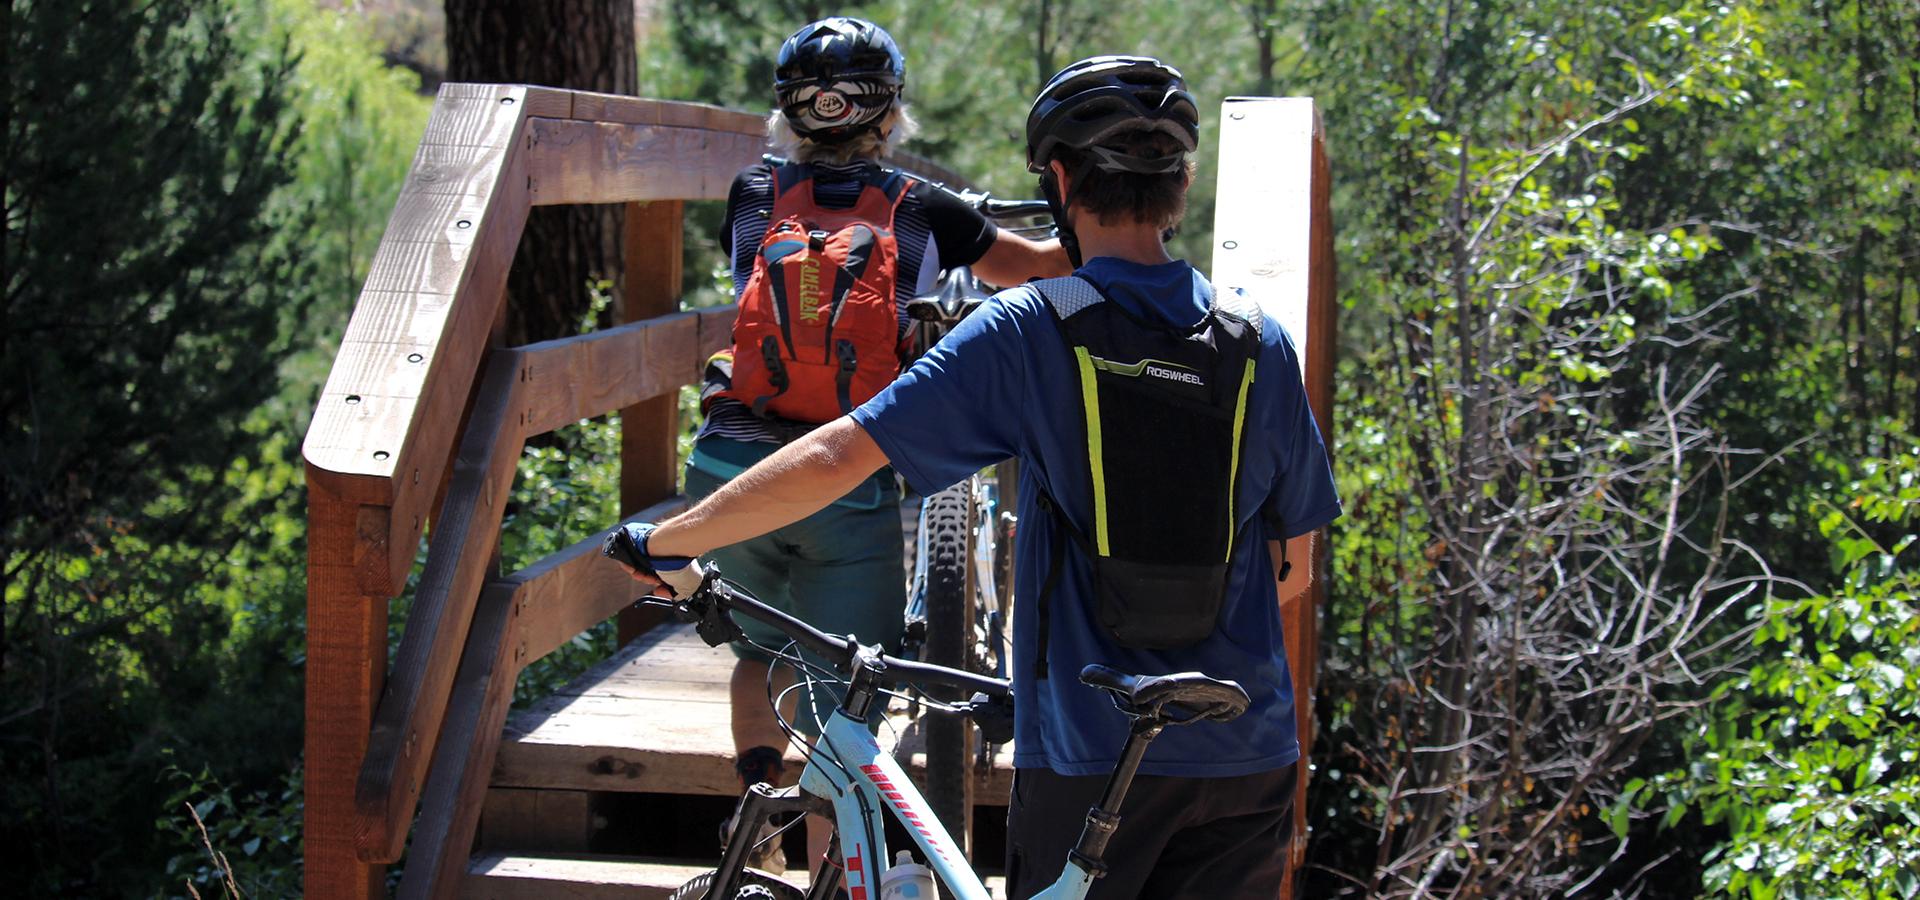 Shevlin-Park-Mountain-Biking-in-Bend